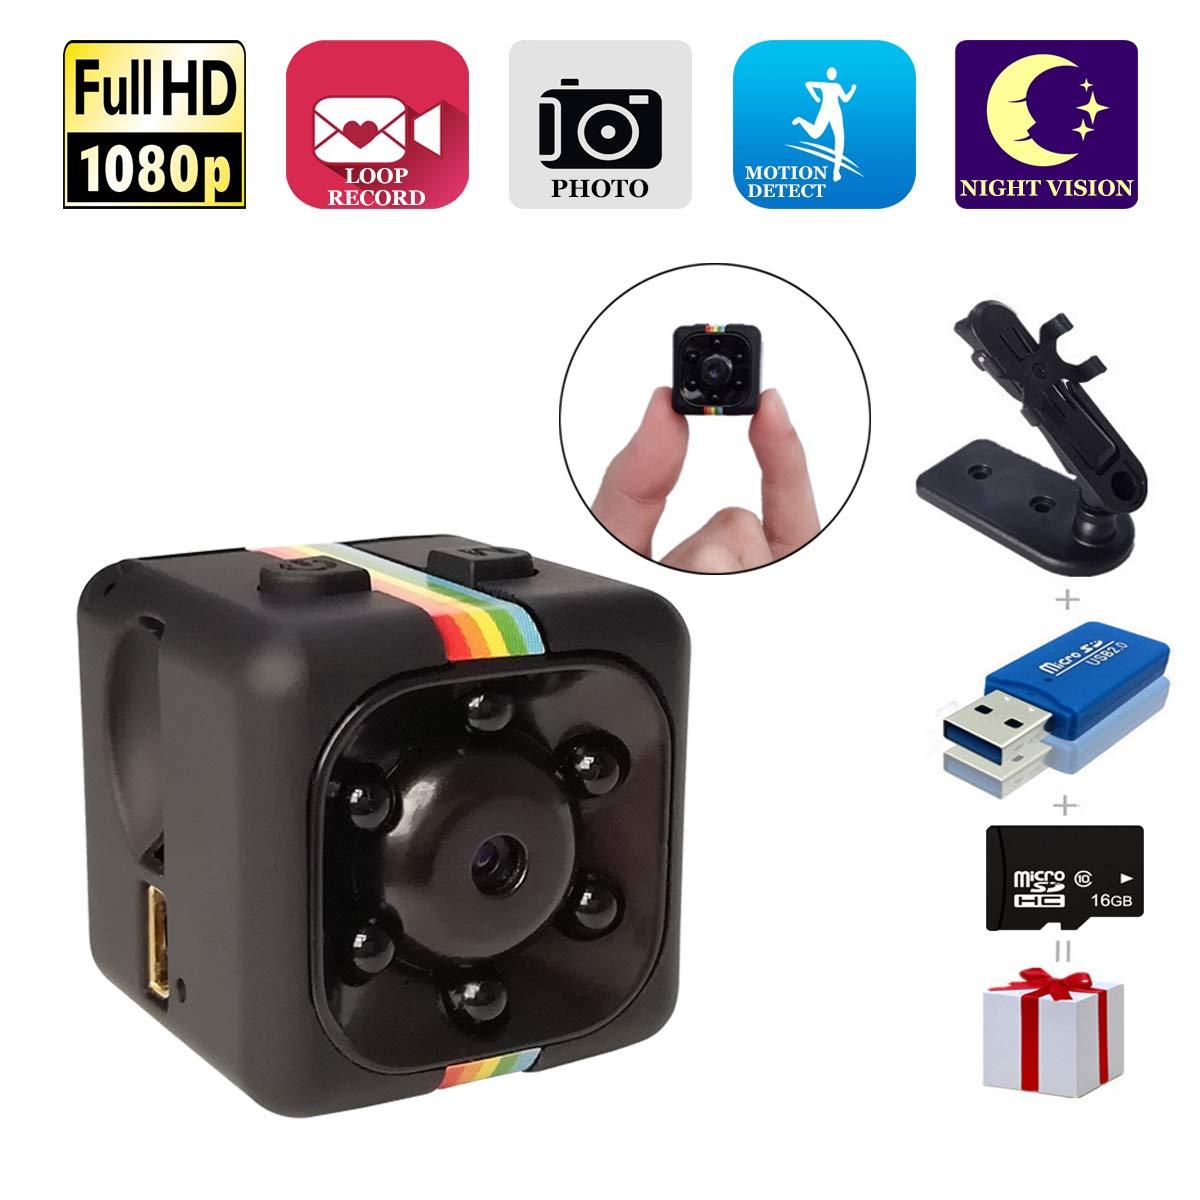 SpyCamera, Papakoyal HiddenCamera Mini Camera HD 1080P/720PSpy Cam WirelessSmallPortable Night Vision Motion Detection for Home, Car, Drone, Office with 16GBCard & Card Reader by PapaKoyal